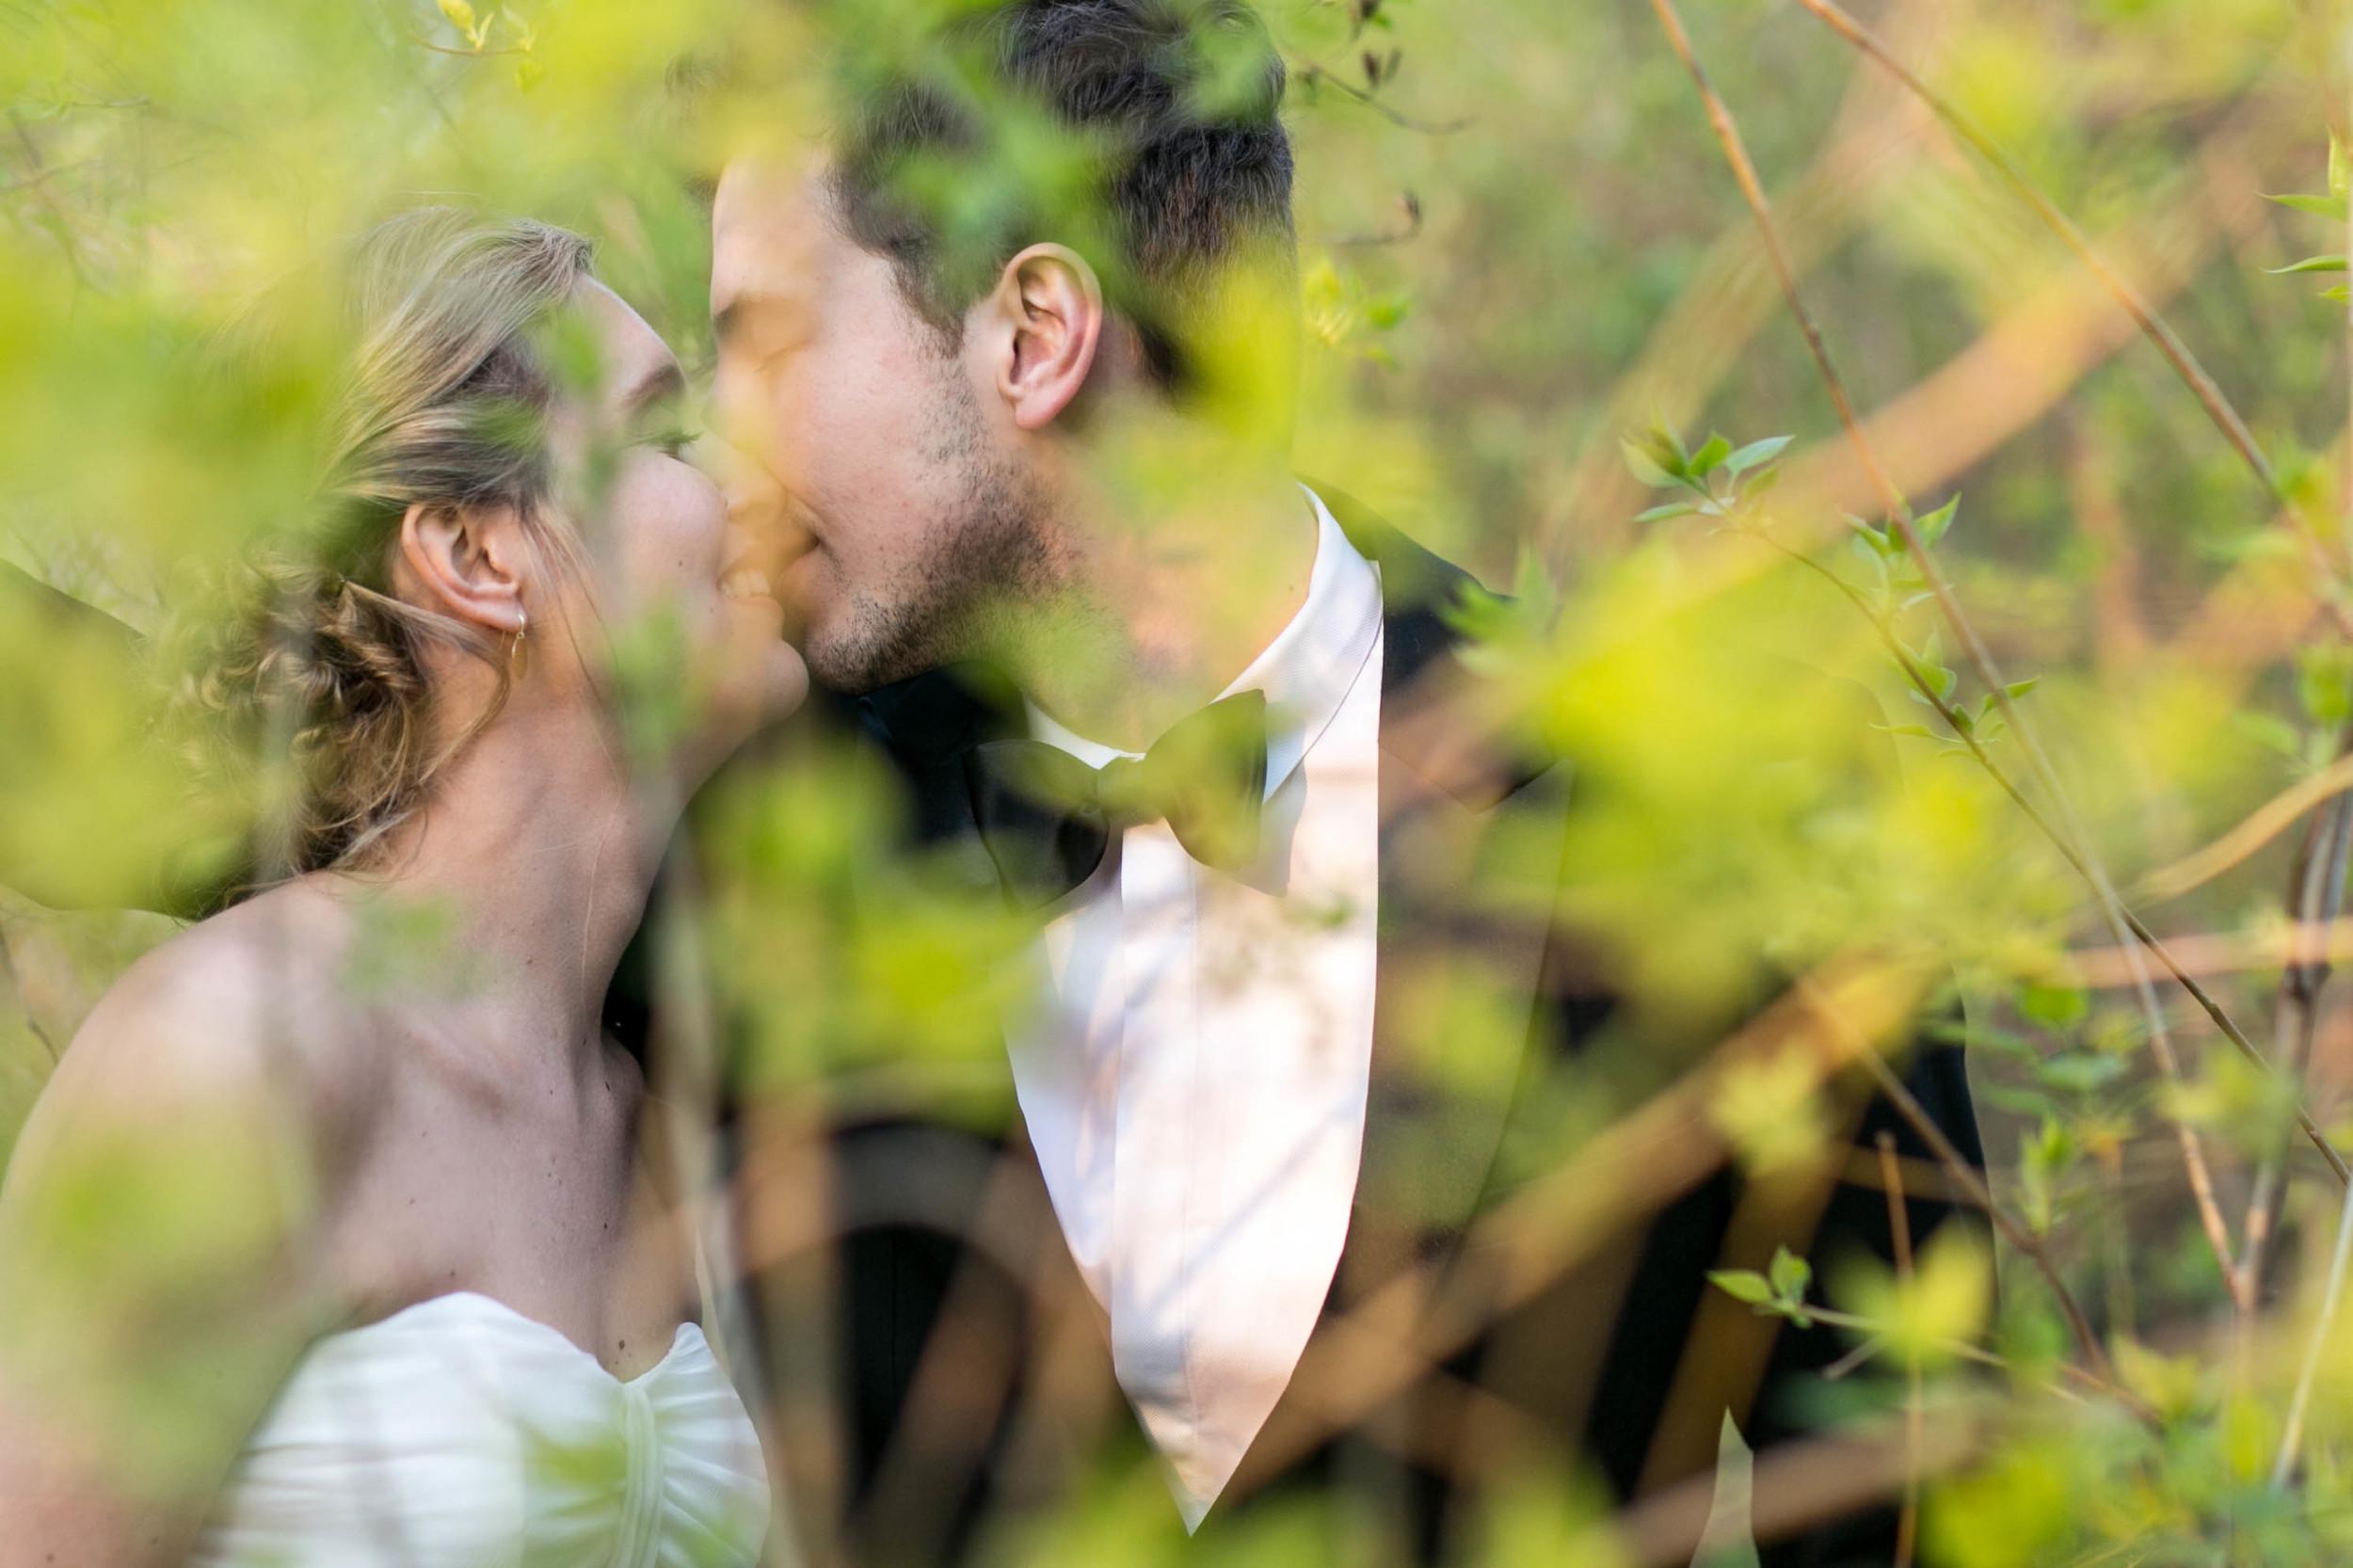 Berlin Hochzeitsfotografie_Fran Burrows Fotografie-121.jpg